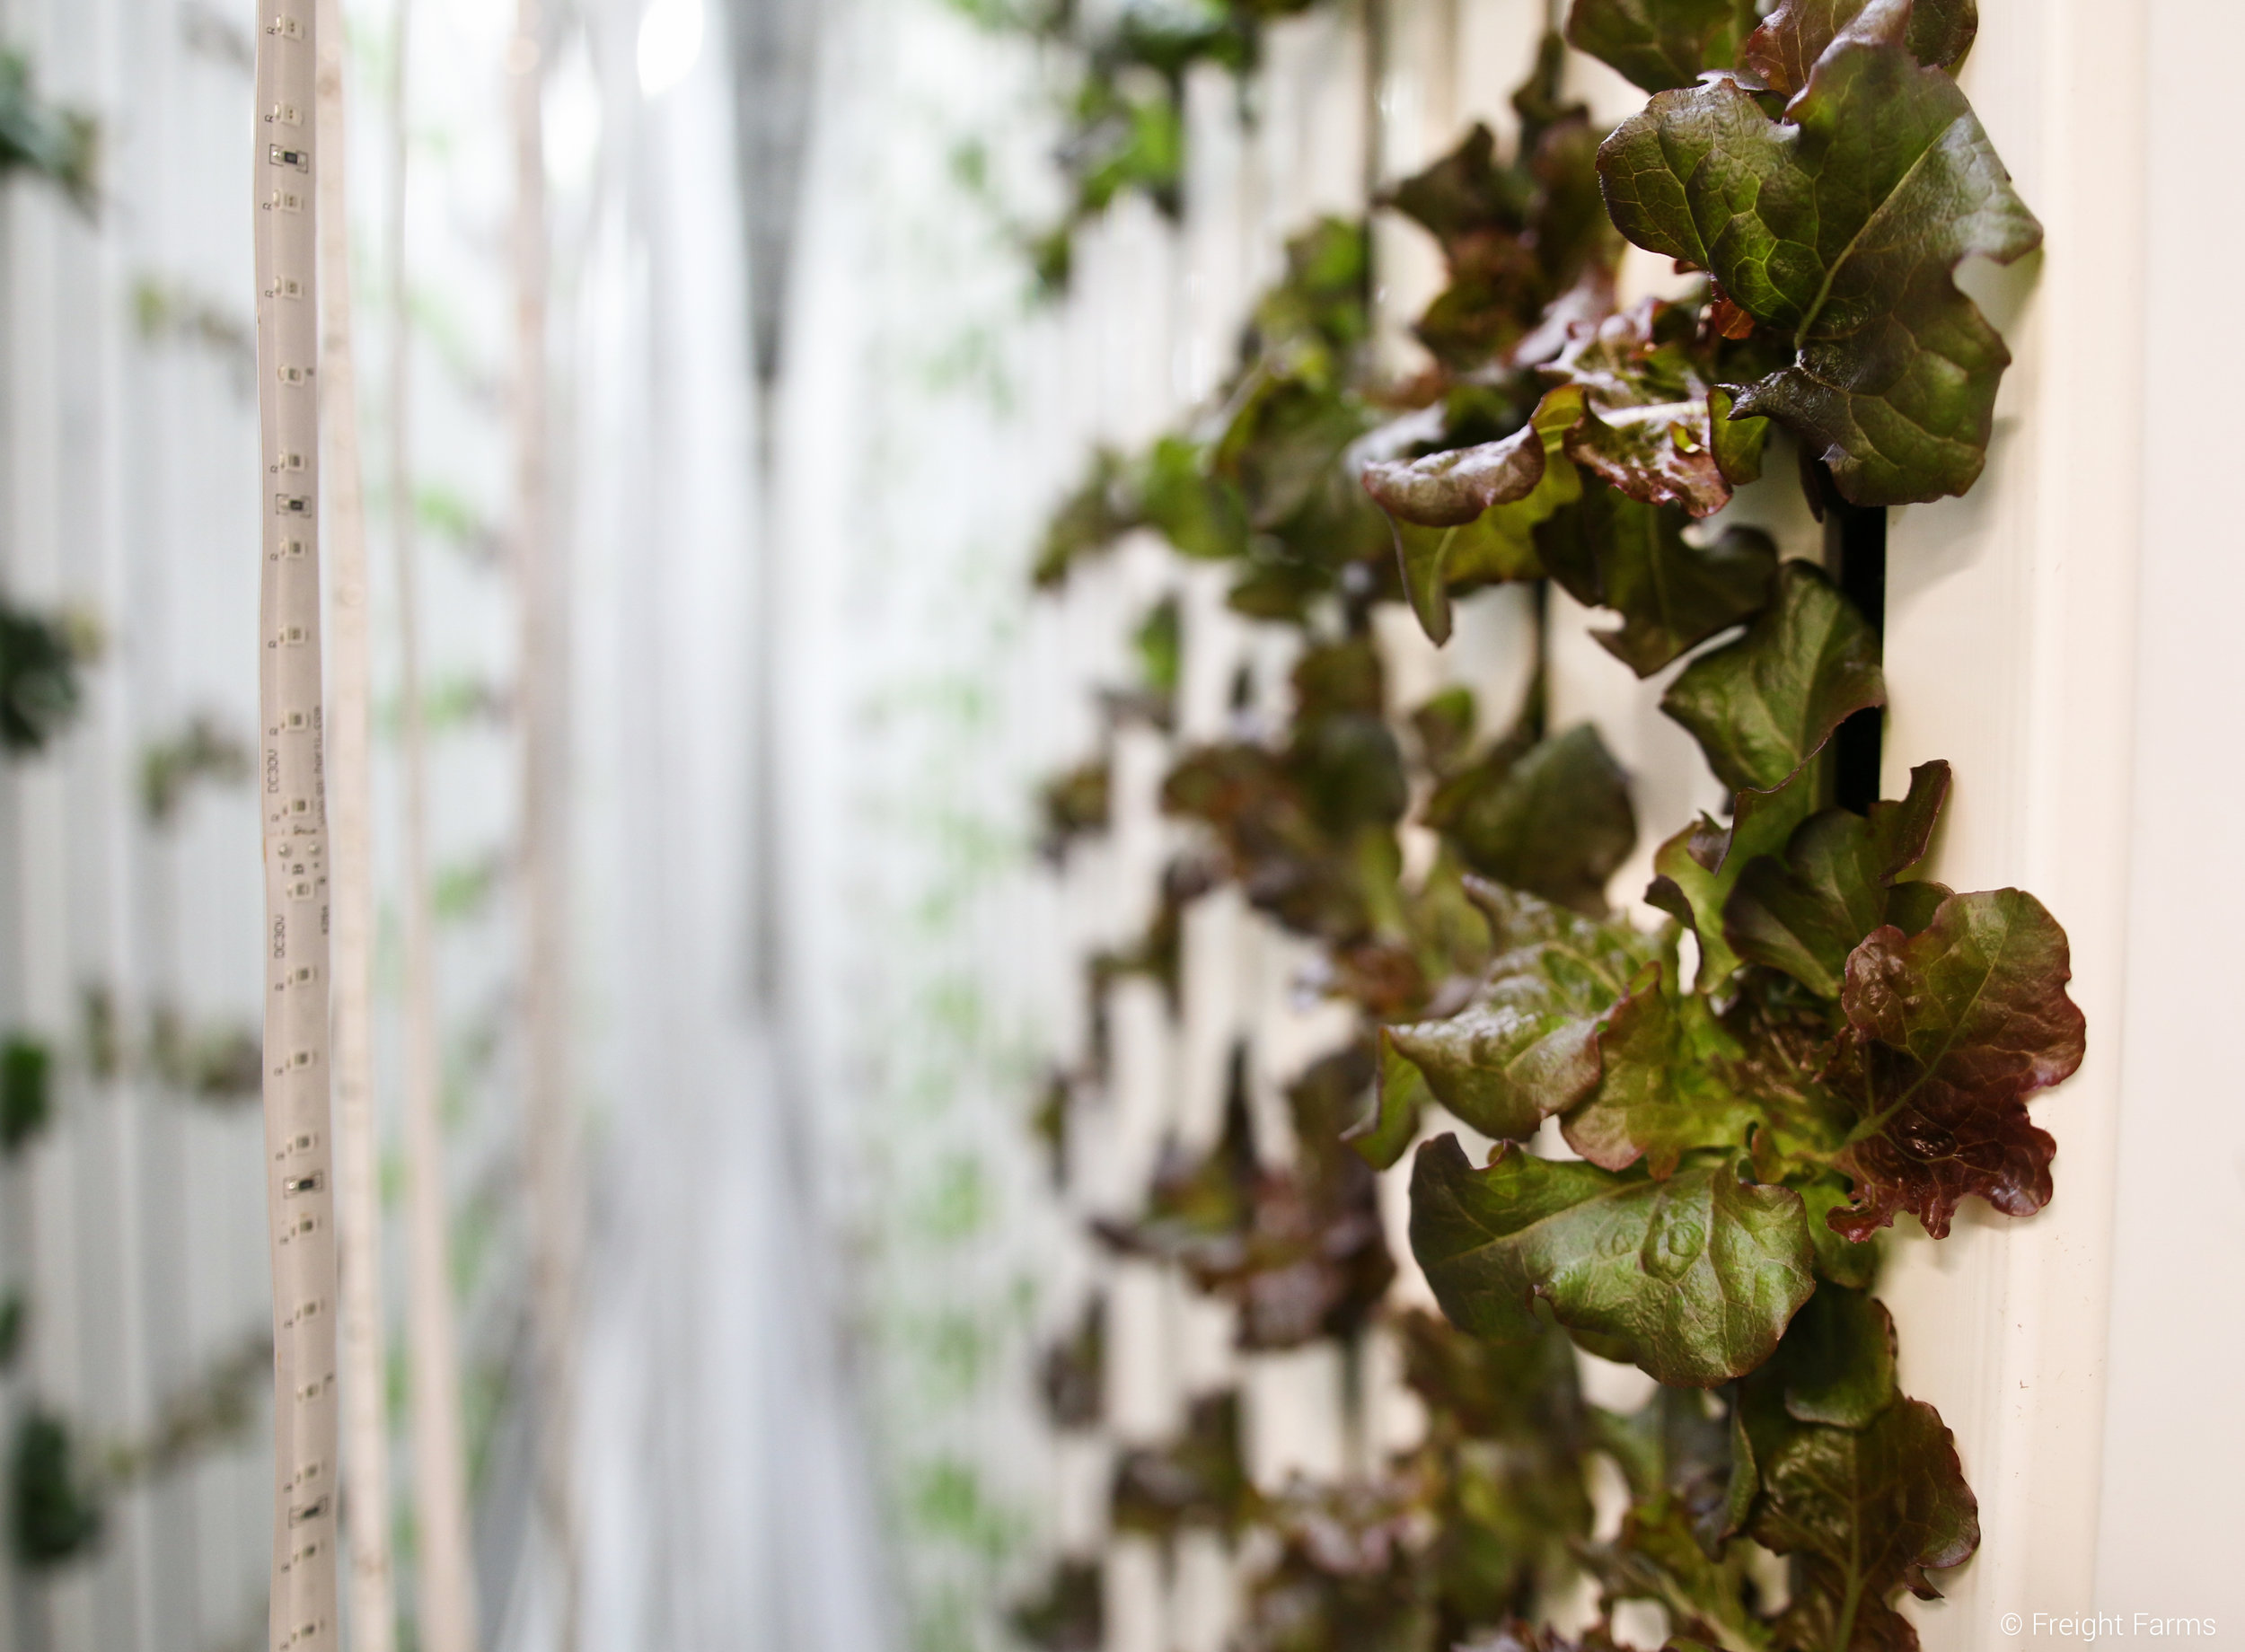 Freight Farms Mature Plants 2.jpg